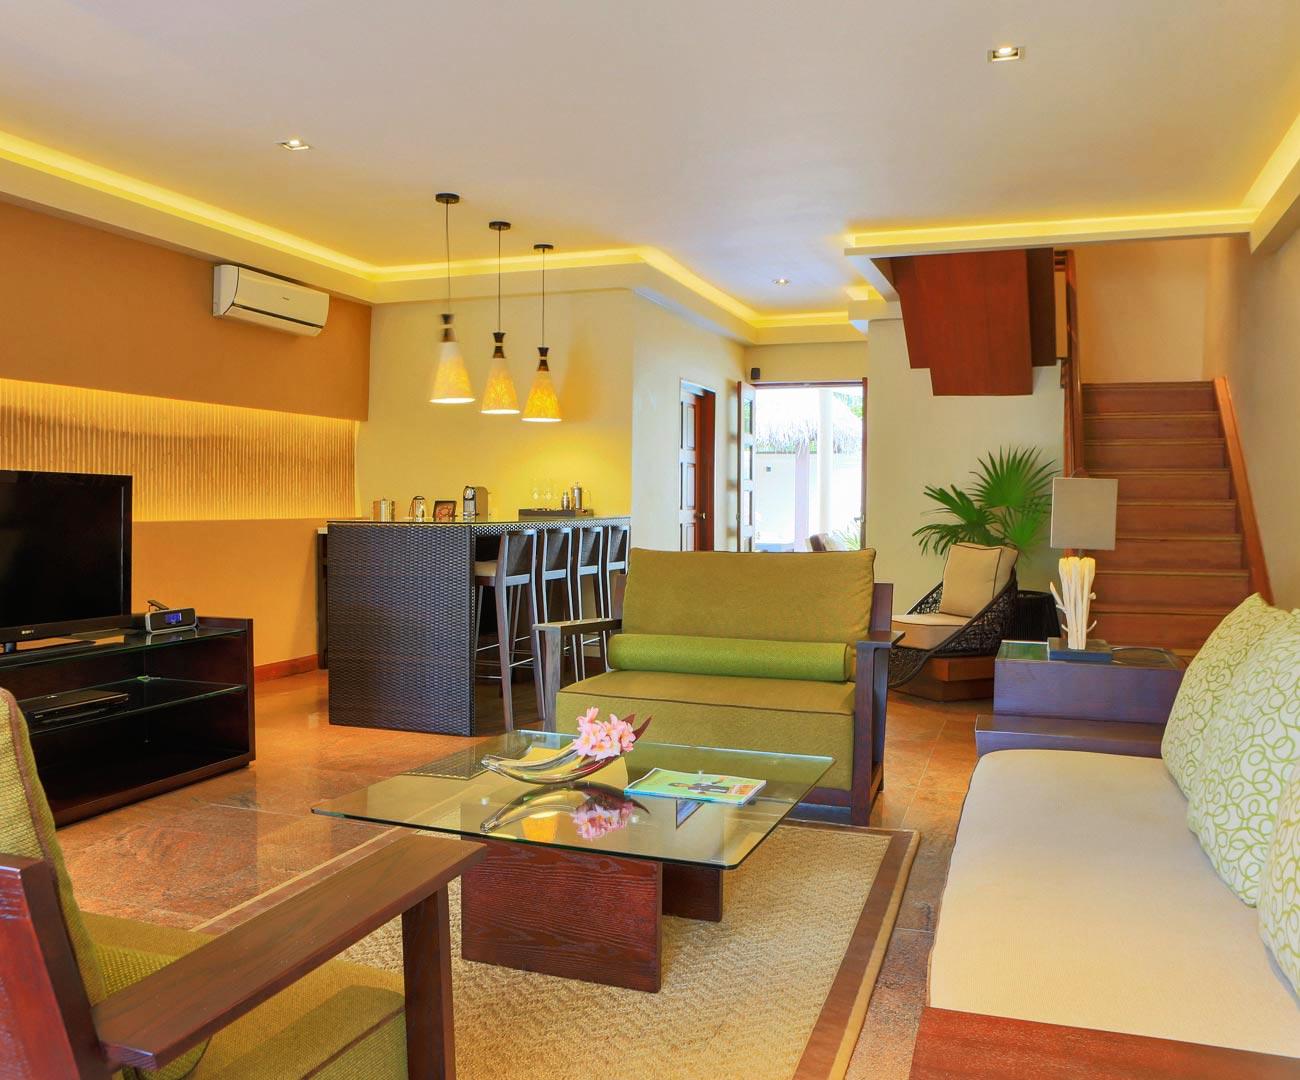 Kurumba Maldives - Presidential Pool Villa - Lounge Image - Maldives Resorts